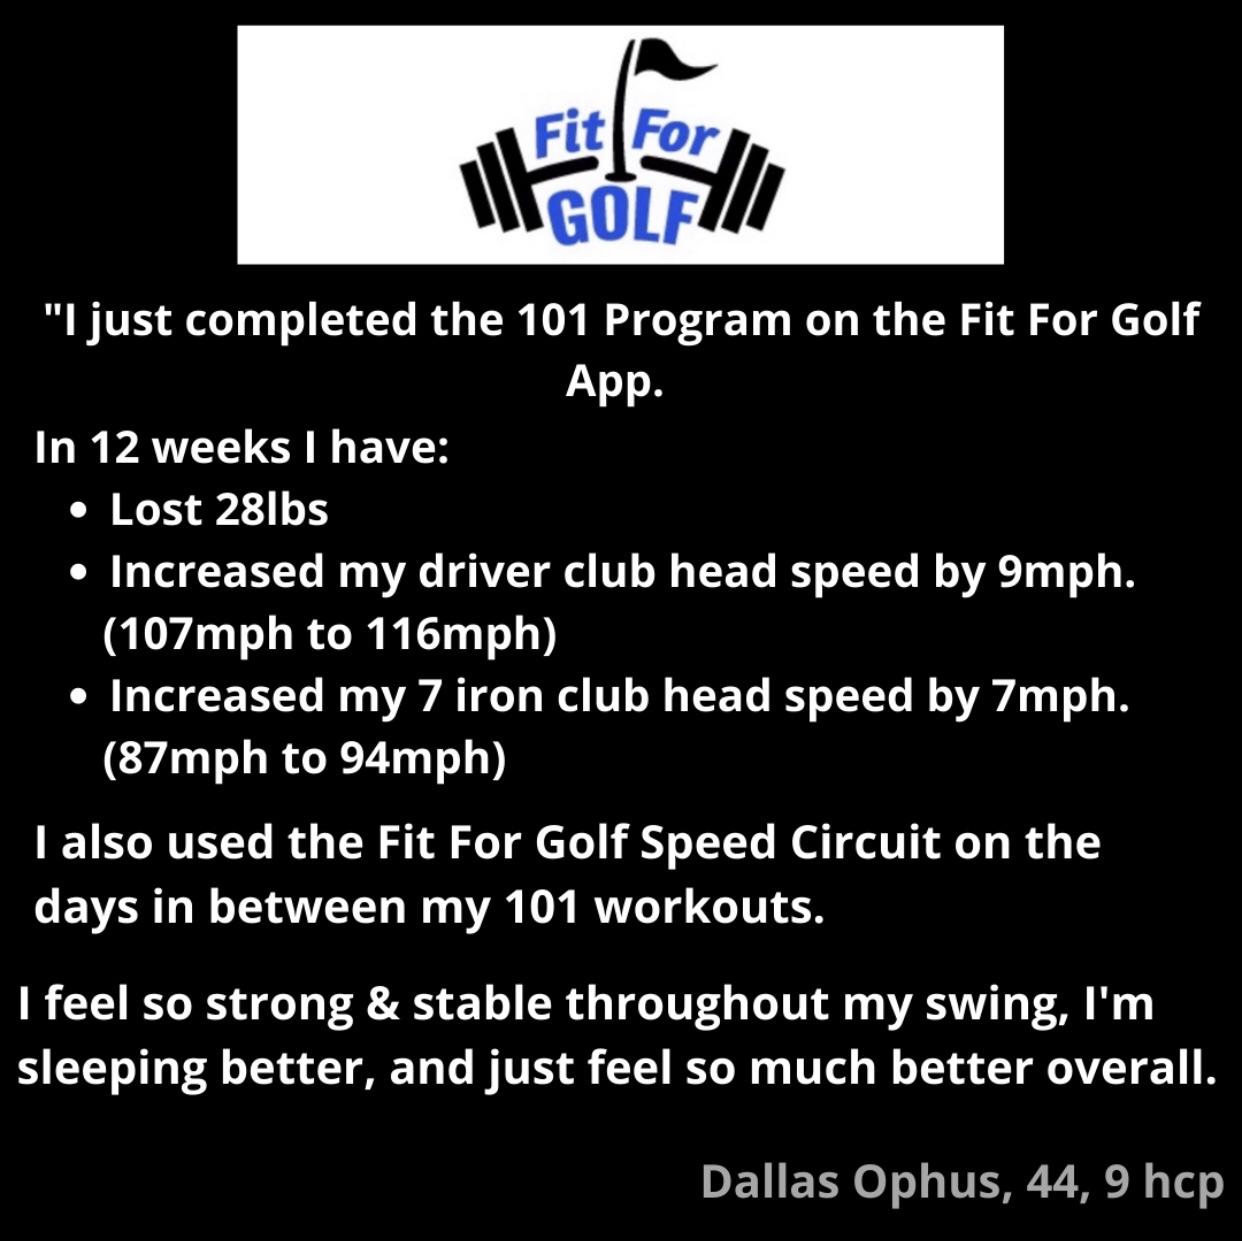 Club Head Speed Increases 9 MPH in 12 weeks